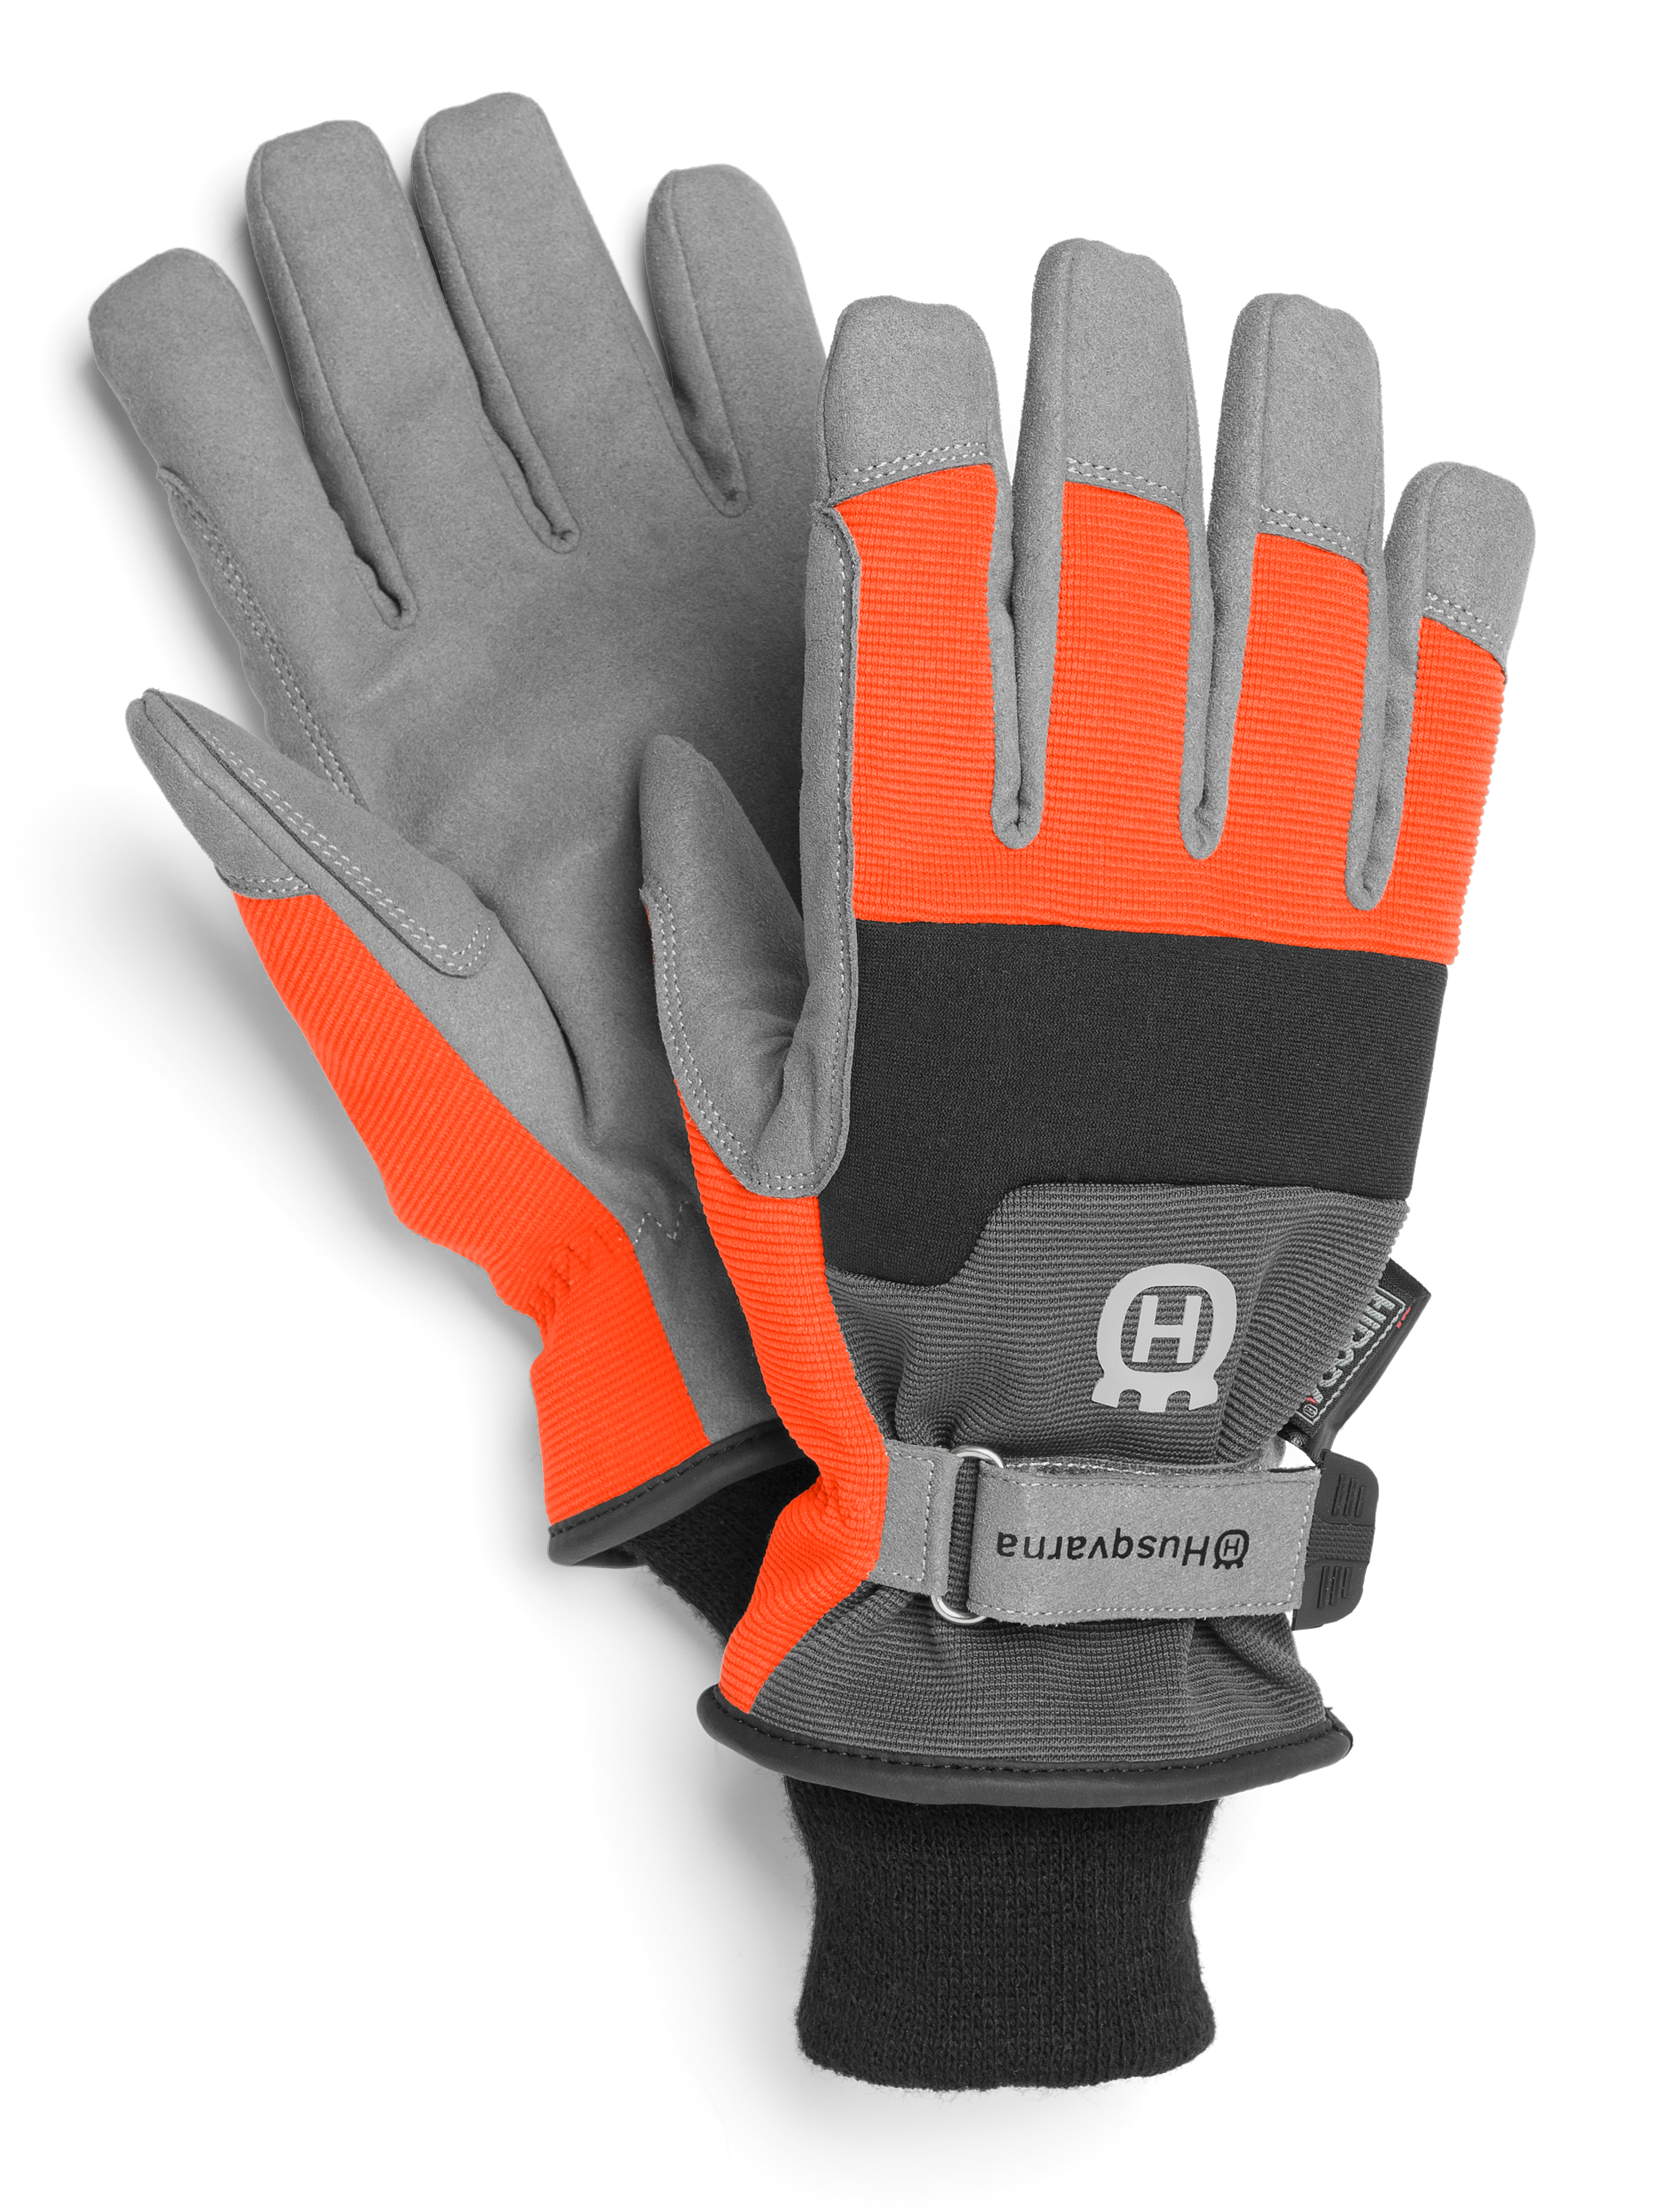 Husqvarna functional winter . Gloves clipart snow gear